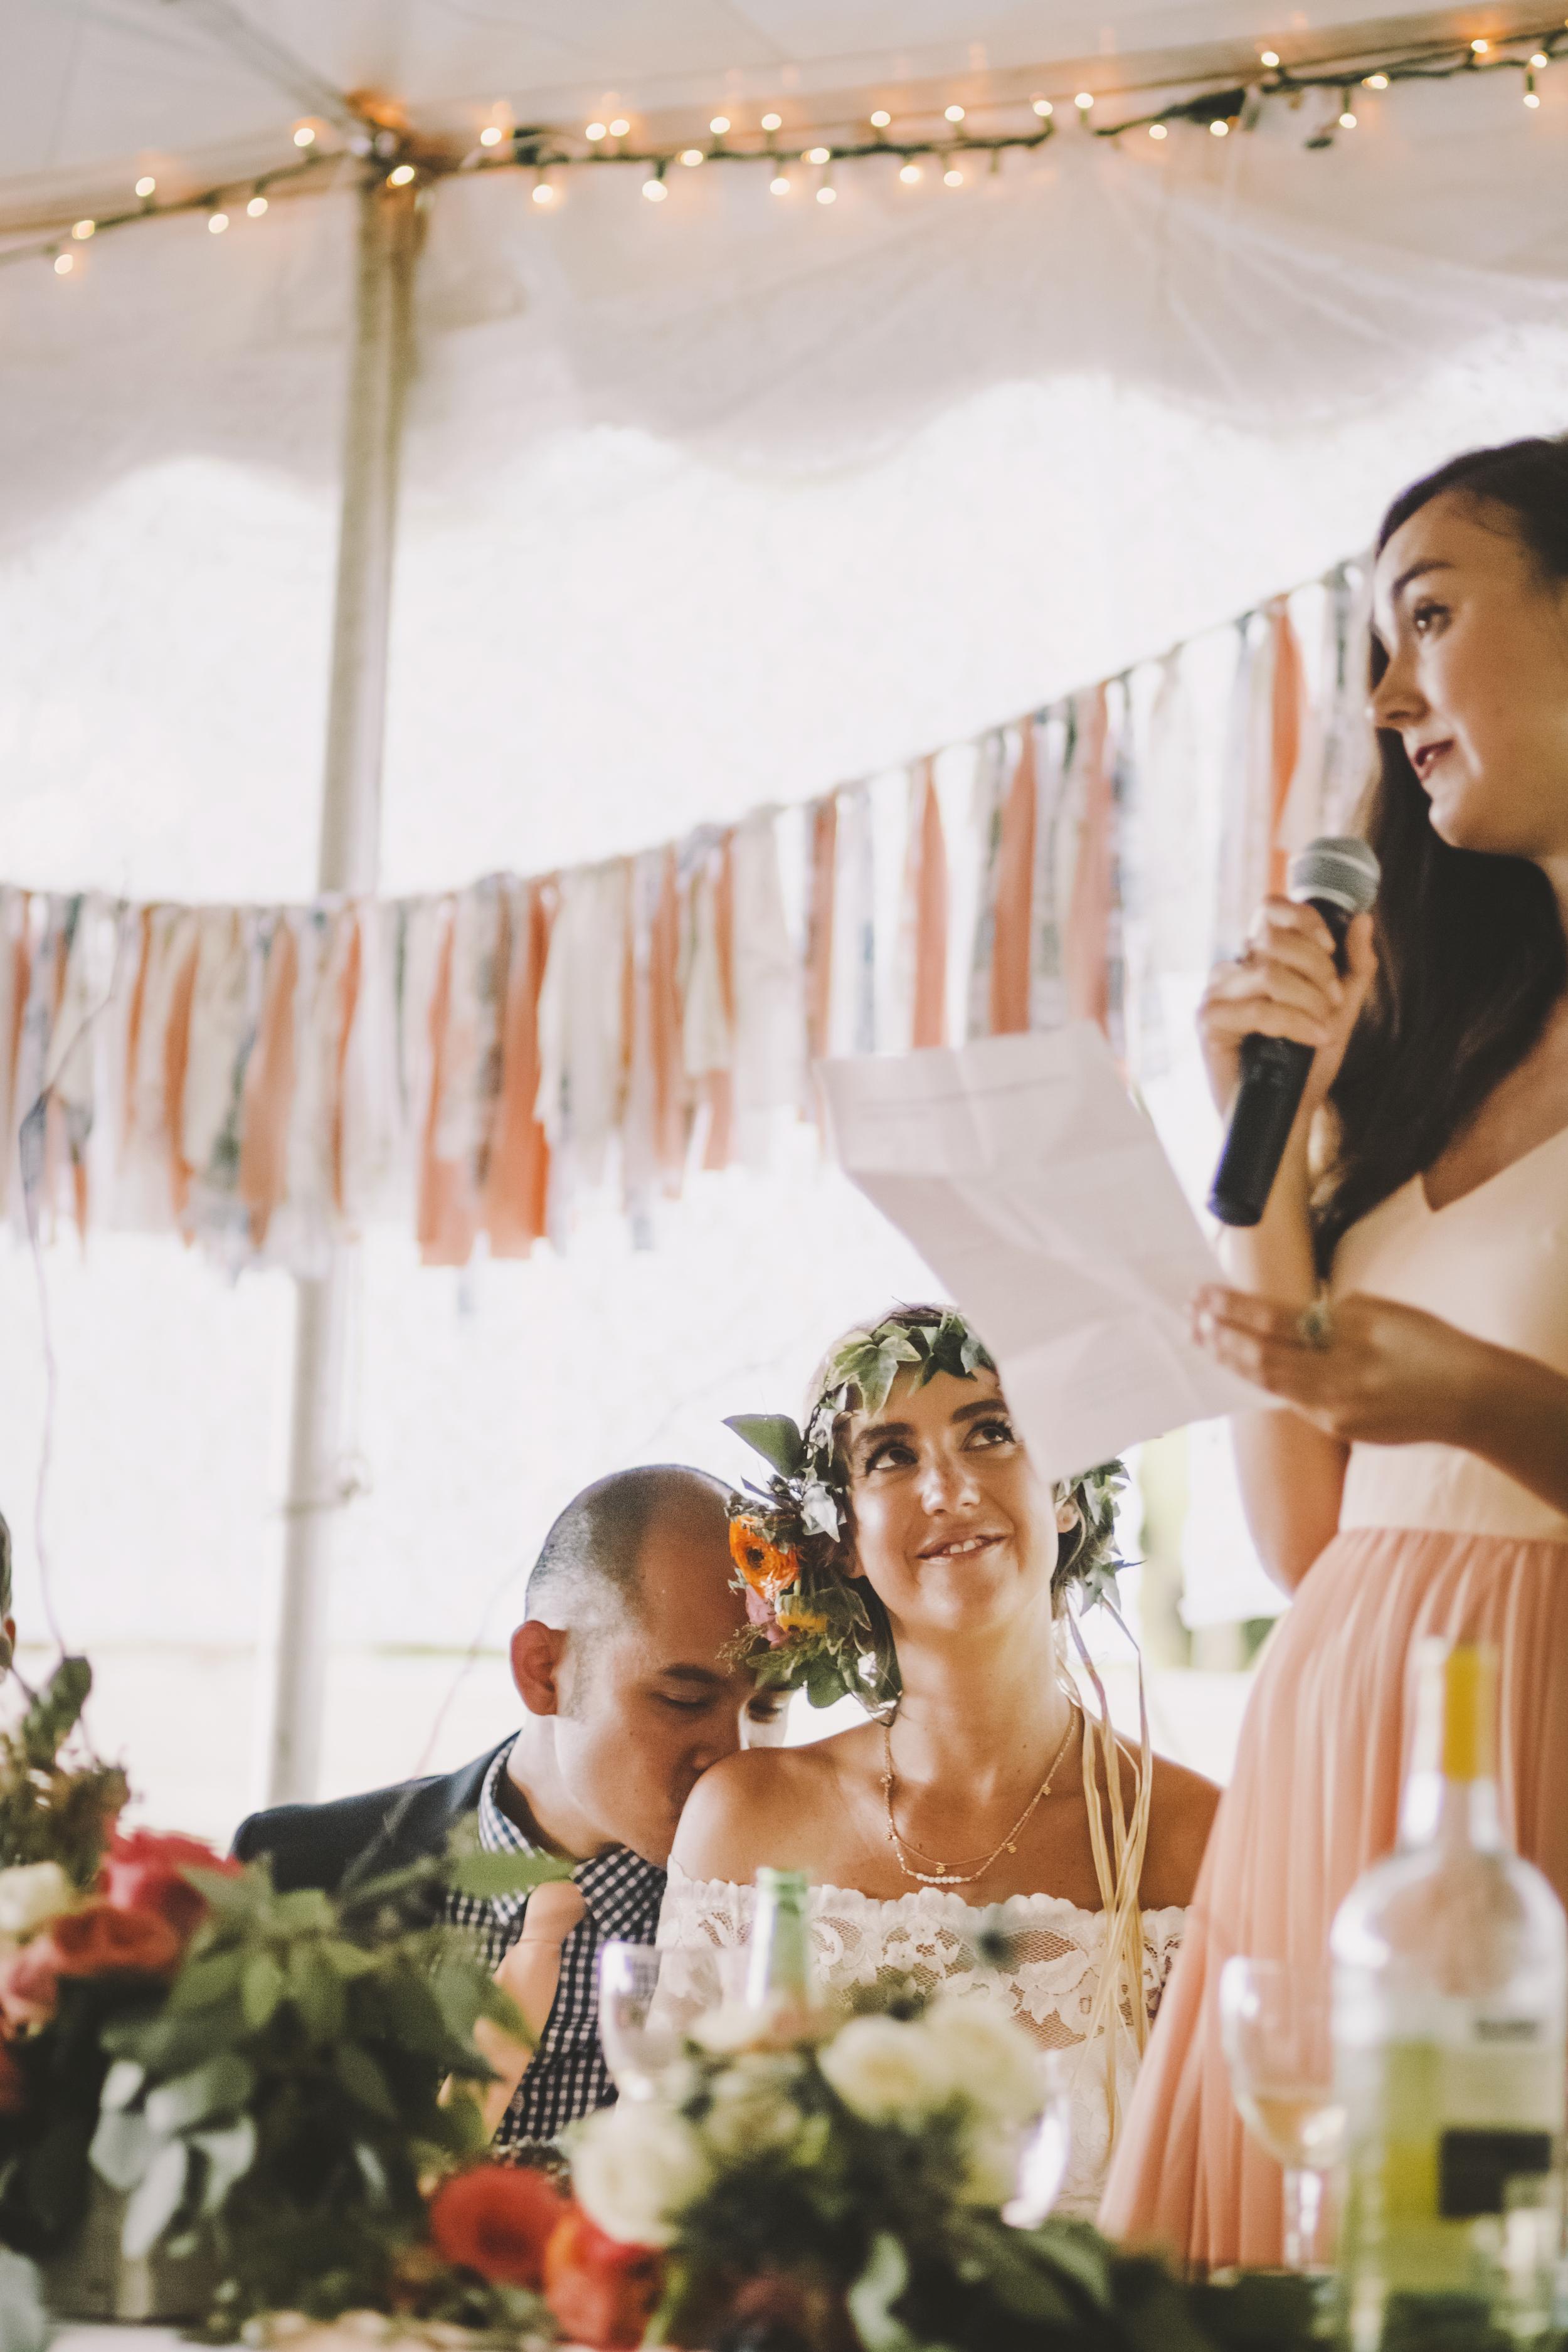 angie-diaz-photography-oahu-hawaii-wedding-tradewinds-ranch-112.jpg